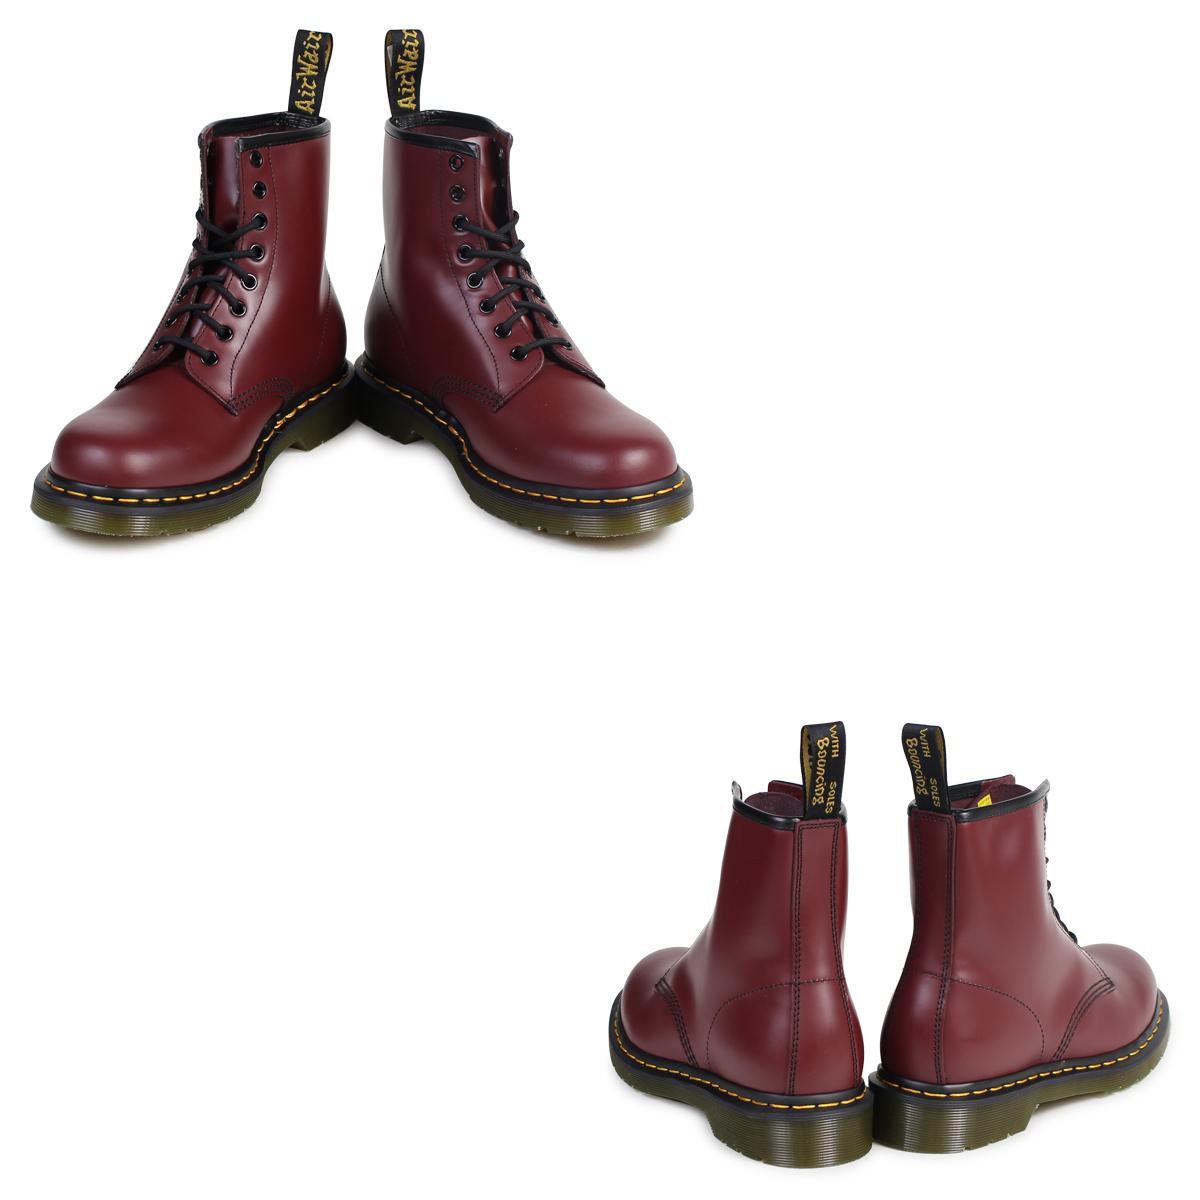 02adfe66b543 ... Dr.Martens Dr. Martens 1460 8 hole boots 8 EYE BOOT 11822006 11822600  men ...